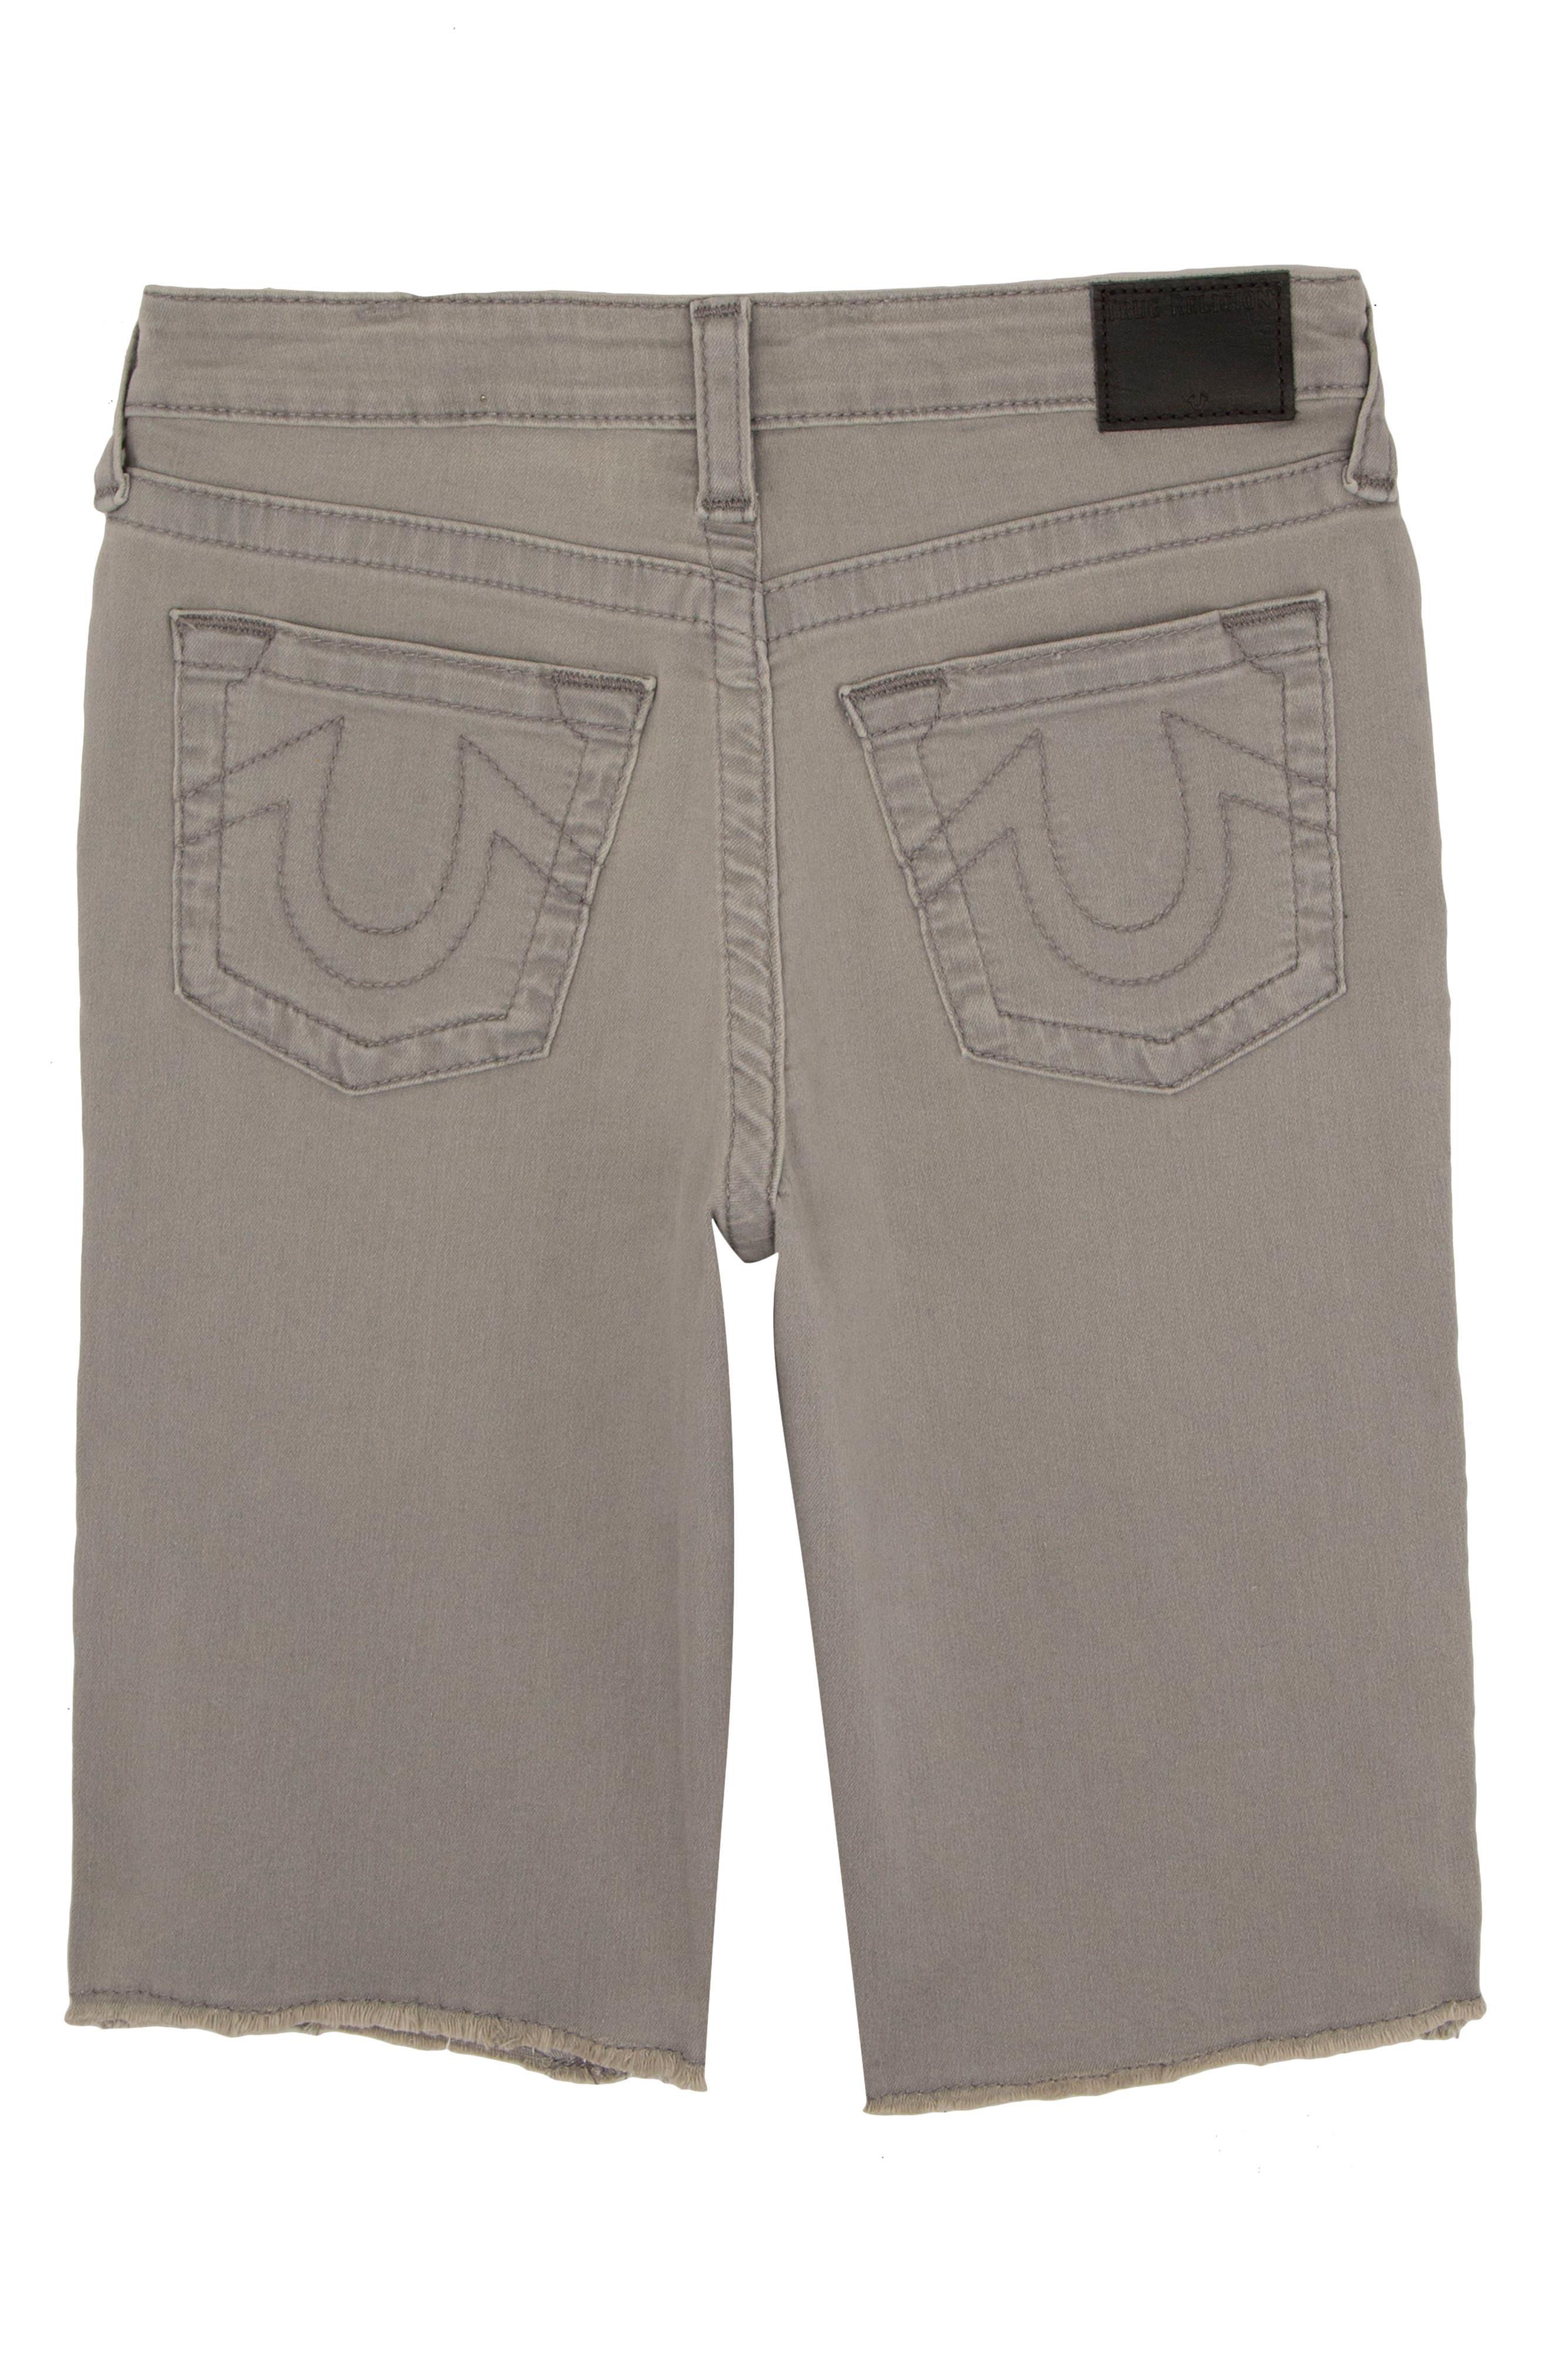 Geno Shorts,                             Alternate thumbnail 2, color,                             Grey Sky